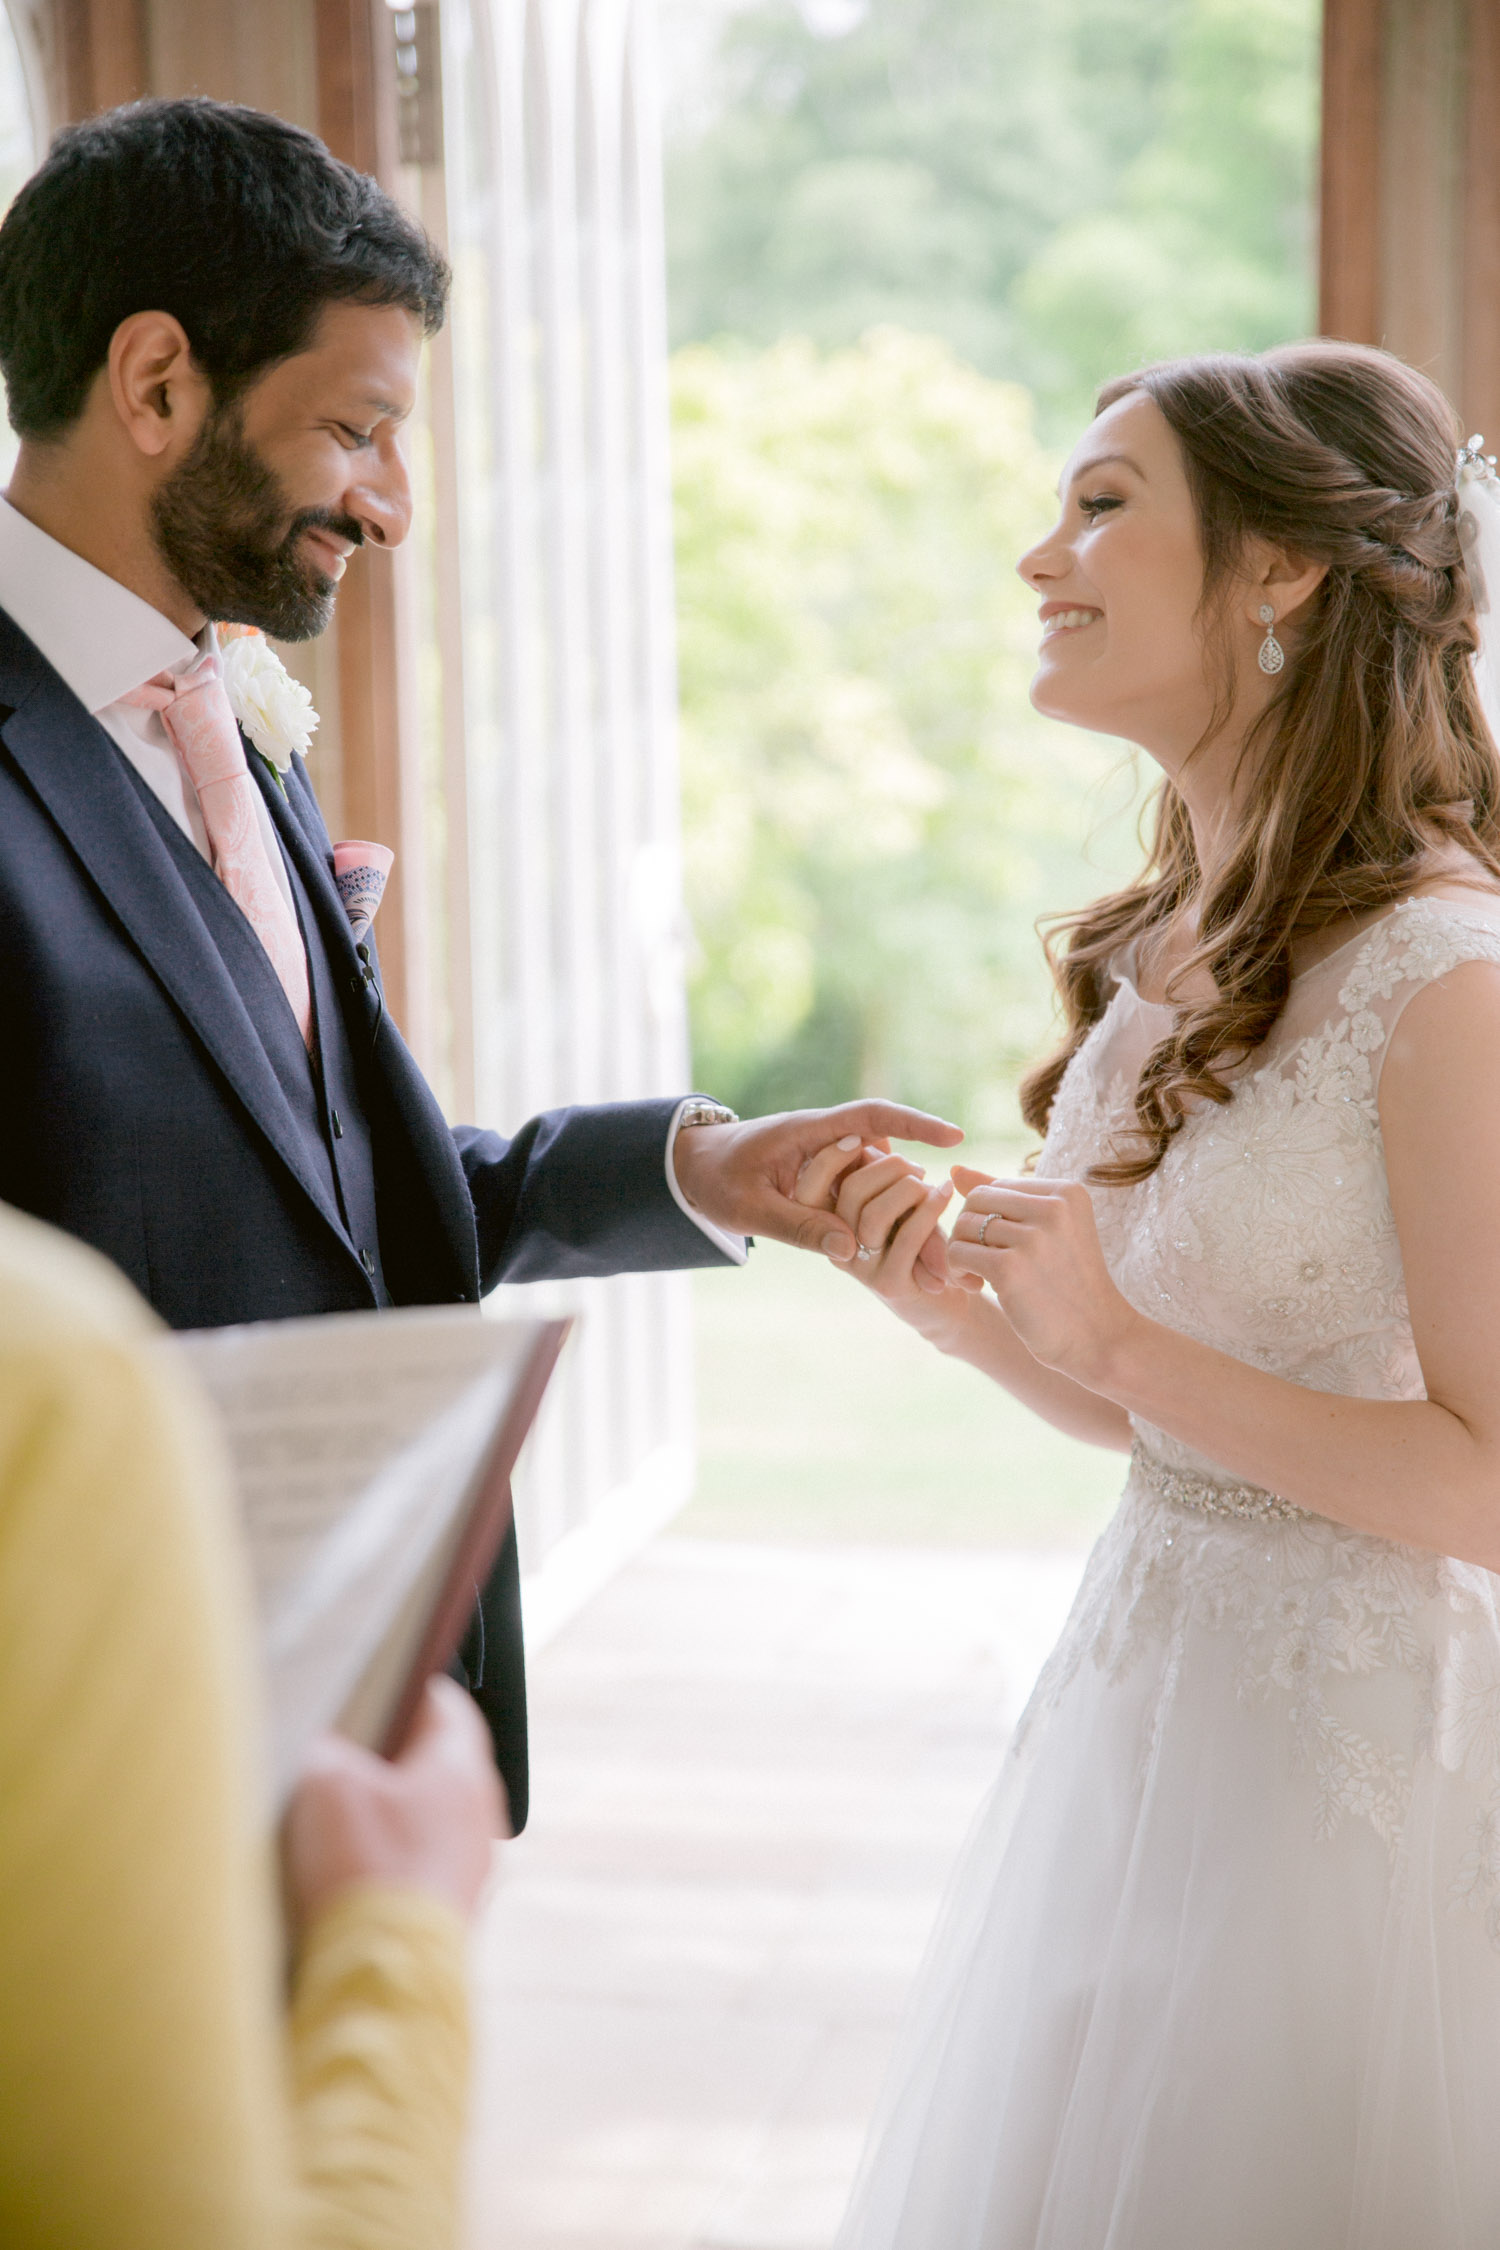 Ayrshire Luxury Wedding Photographer | Culzean Castle Wedding Photography